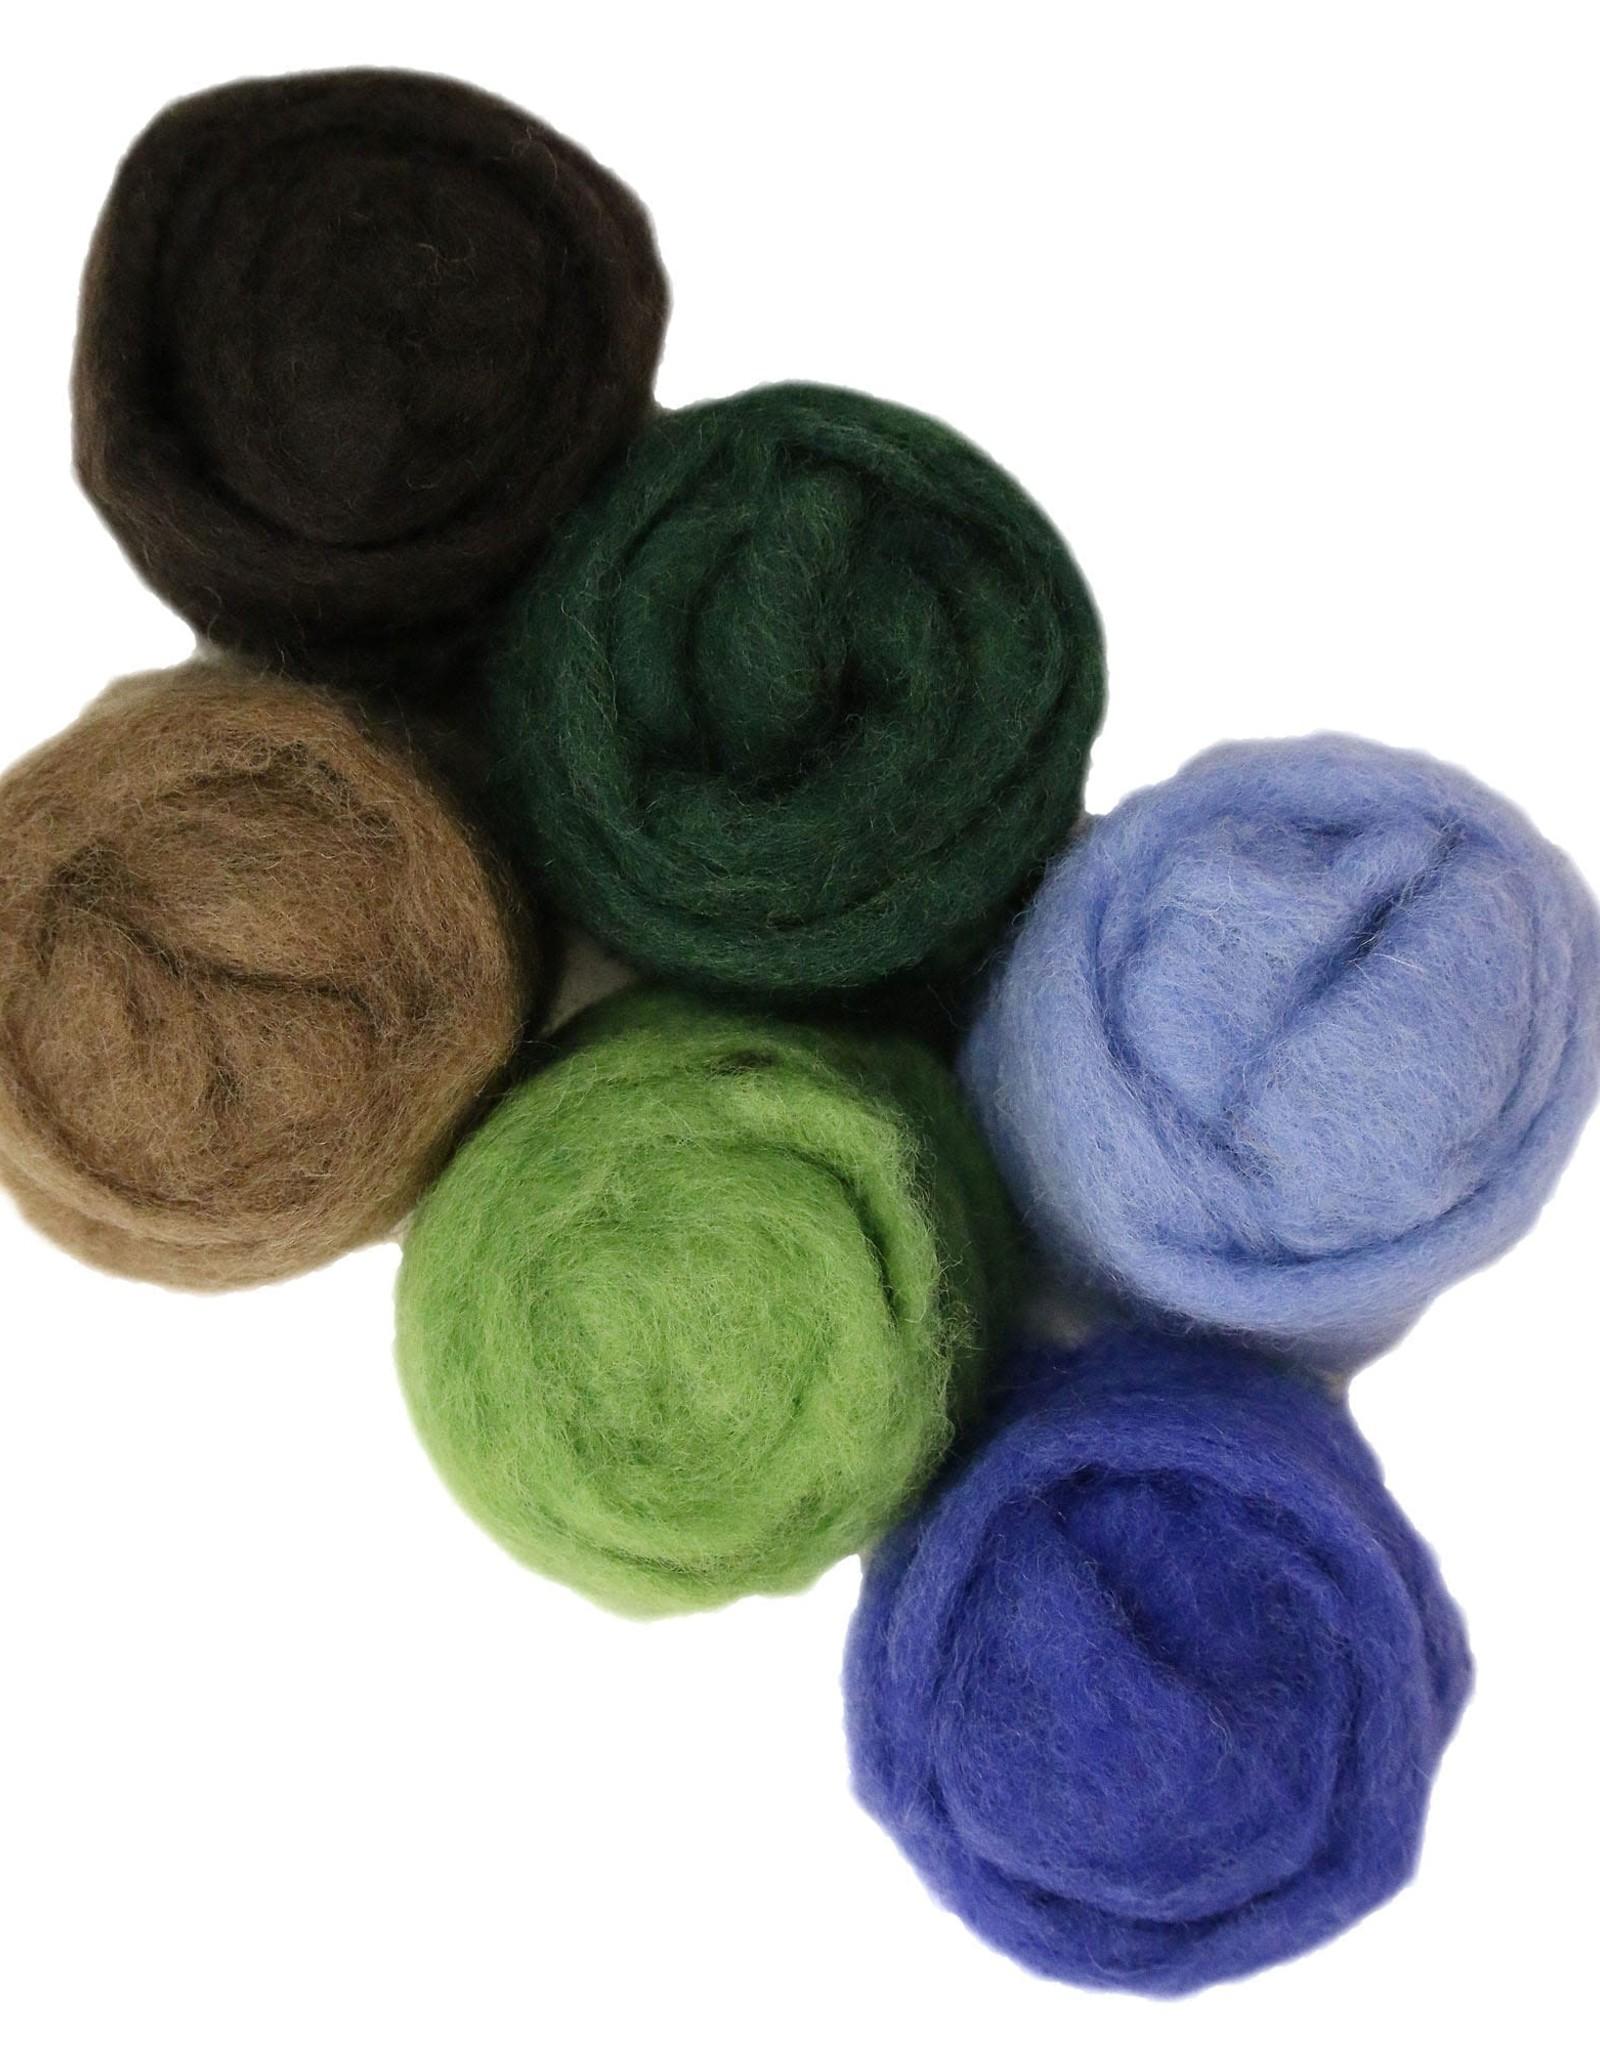 Frabjous Fibers Wooly Bullies Needlefelting Wool by Frabjous Fibers